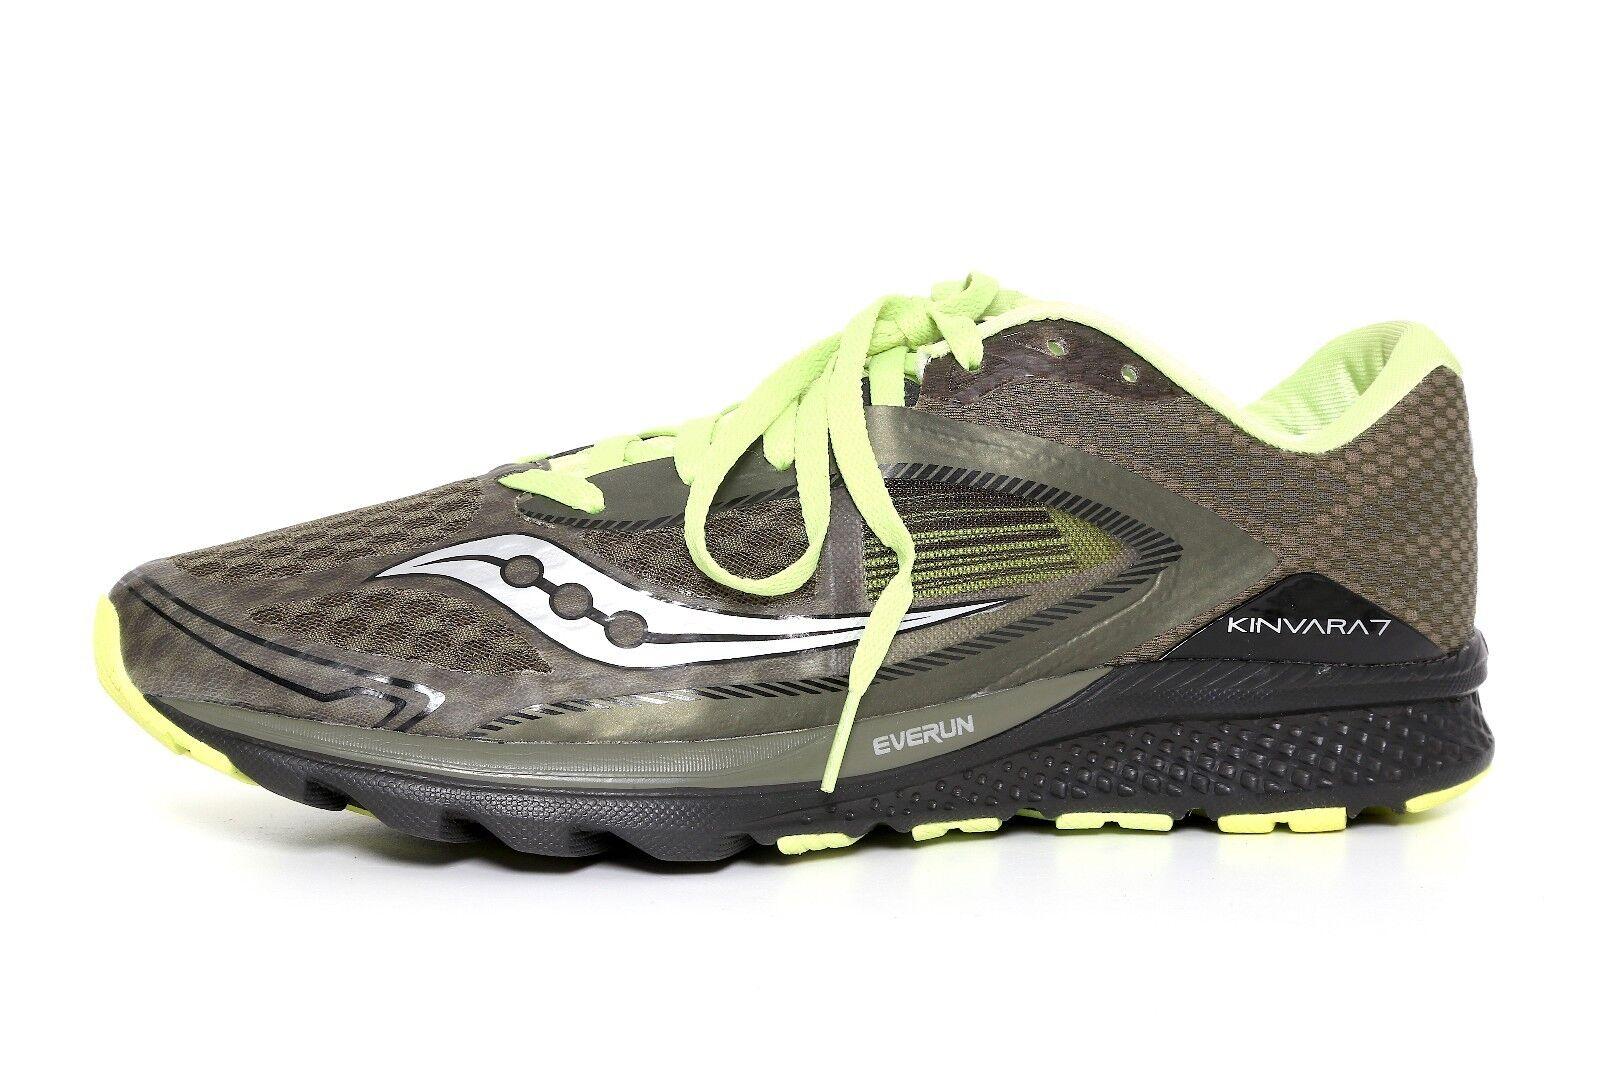 newest 9158d df99d Saucony Uomo Kinvara 7 Neutral Running scarpe 6449 Dimensione 11 11 11 US  838e60